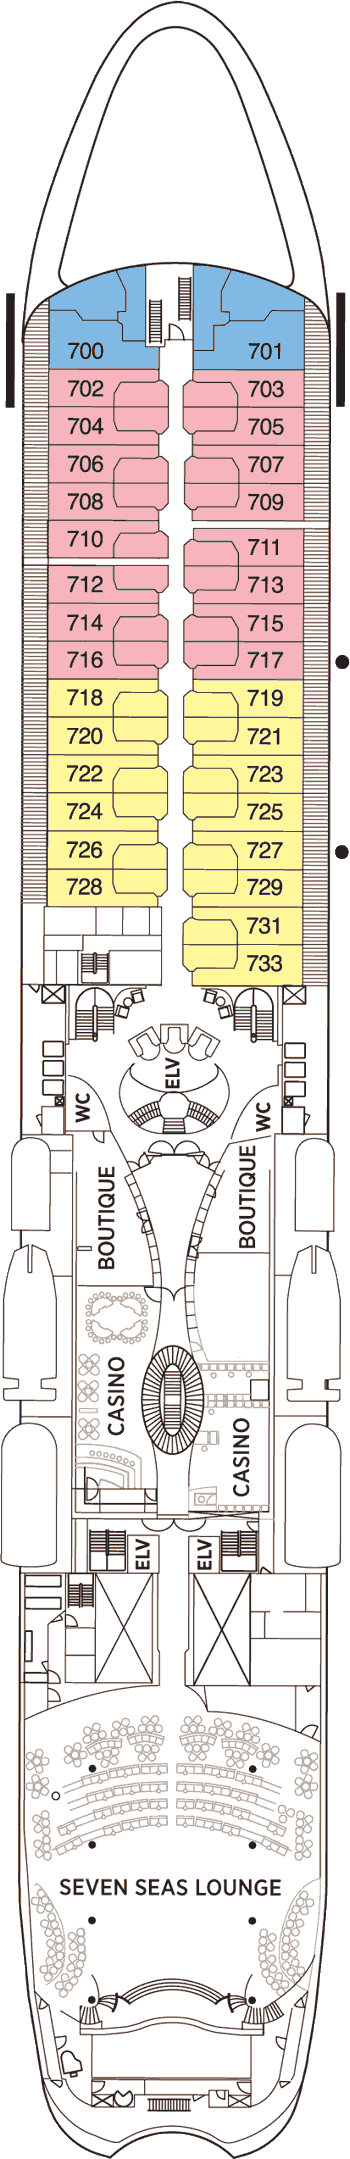 Seven Seas Navigator - Deck 7